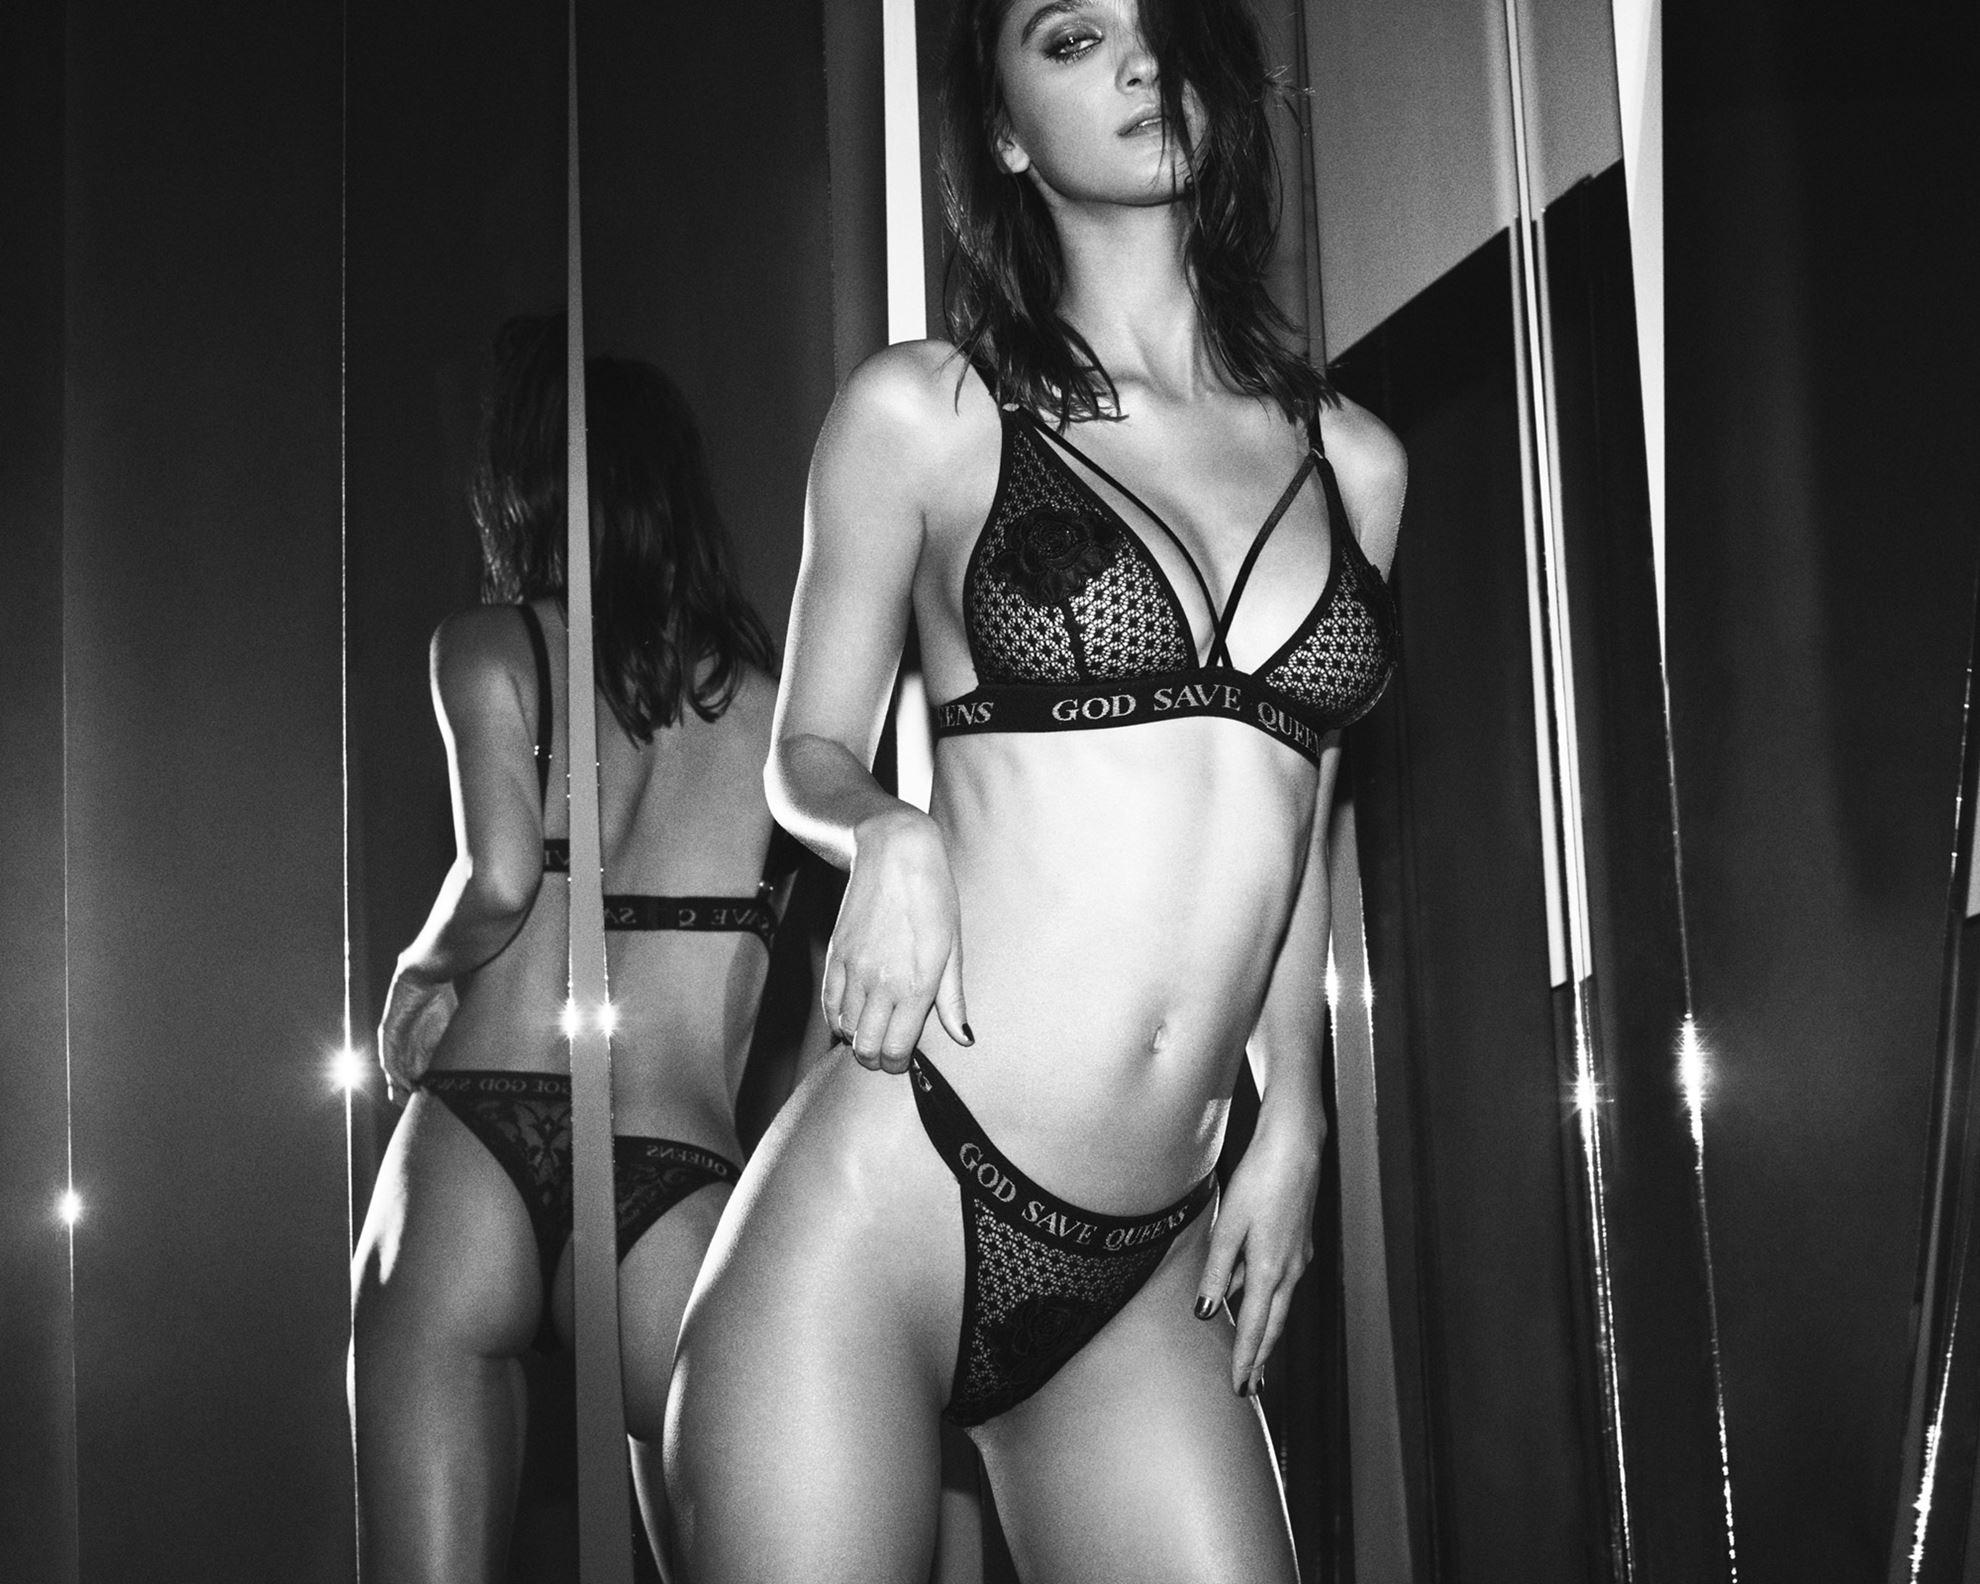 Photos Paula Bulczynska nudes (81 photo), Tits, Hot, Instagram, underwear 2006